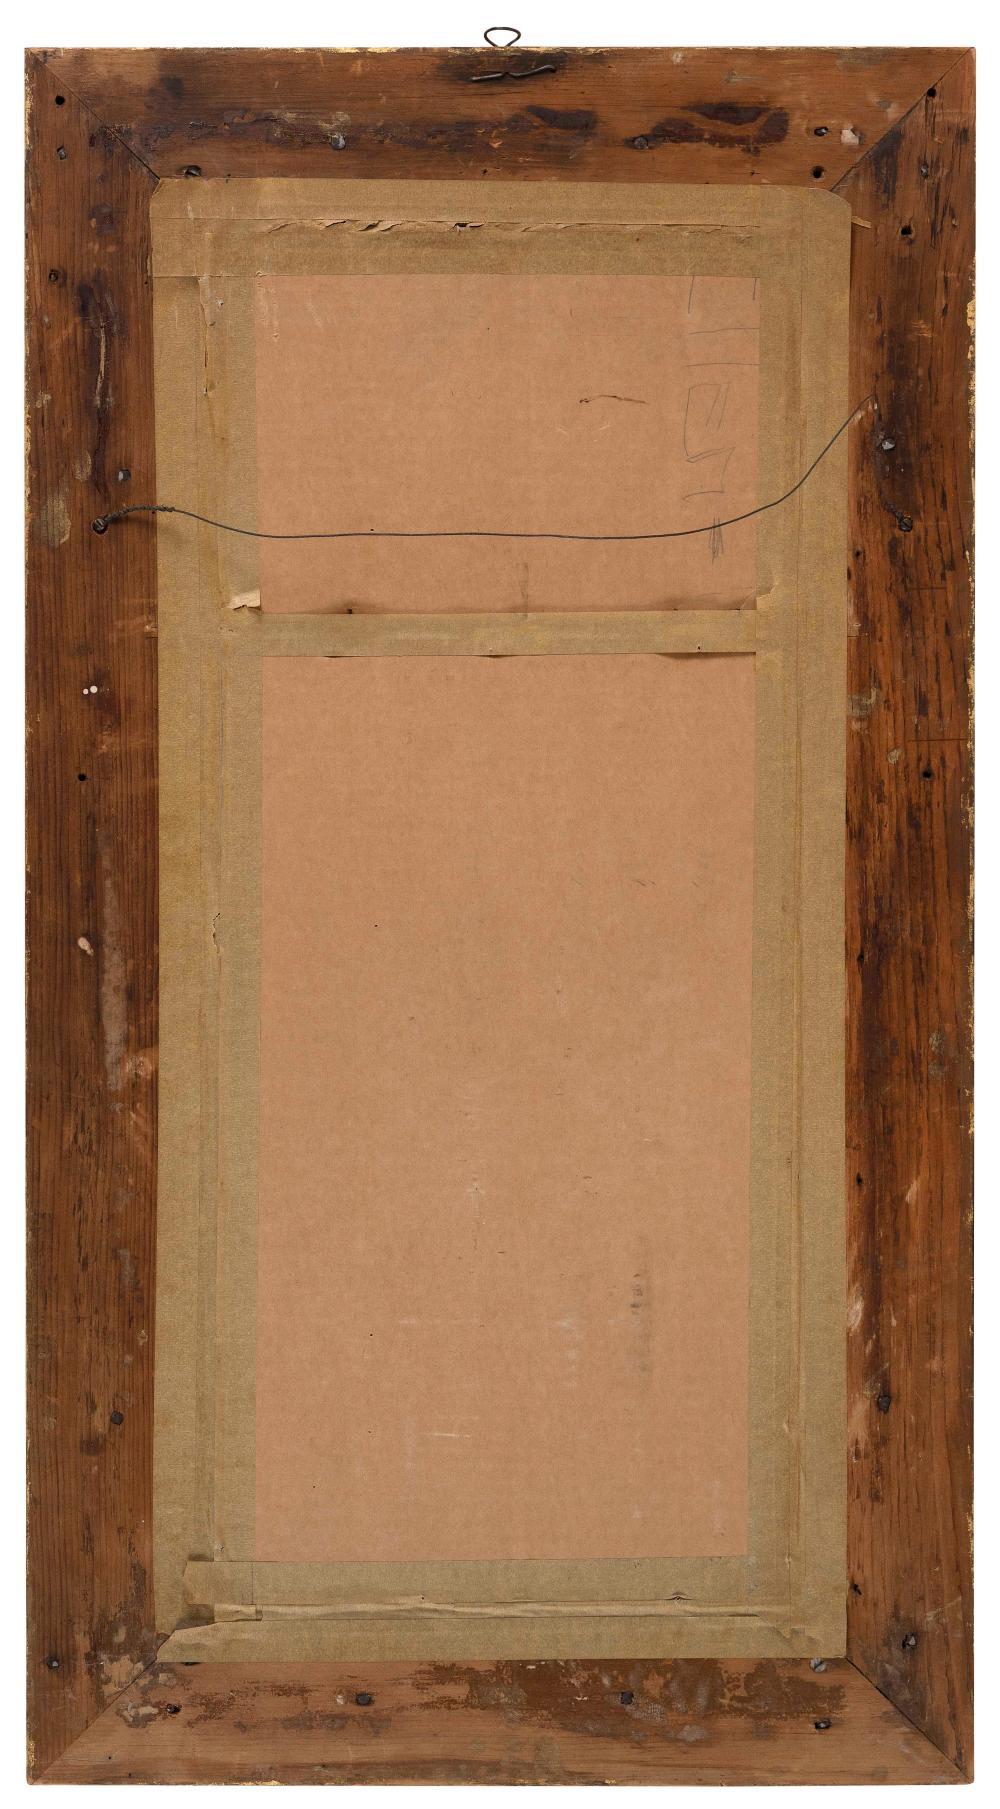 FEDERAL HALF-COLUMN MIRROR America, Circa 1825 Height 36